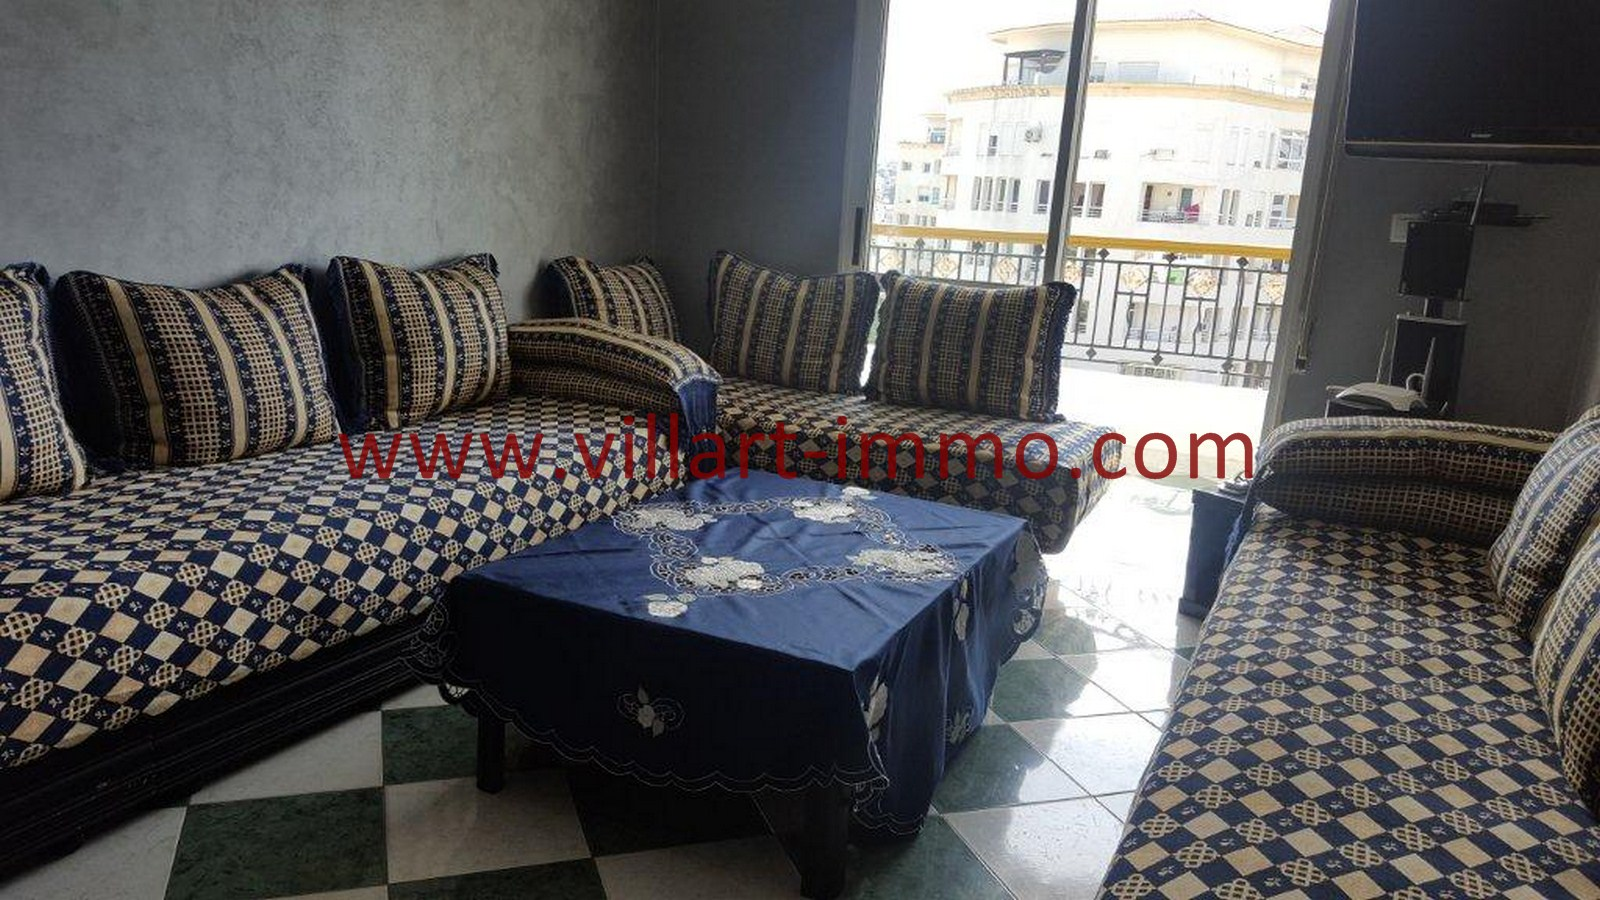 4-Vente-Appartement-Tanger-Malabata-Salon-VA507-Villart Immo